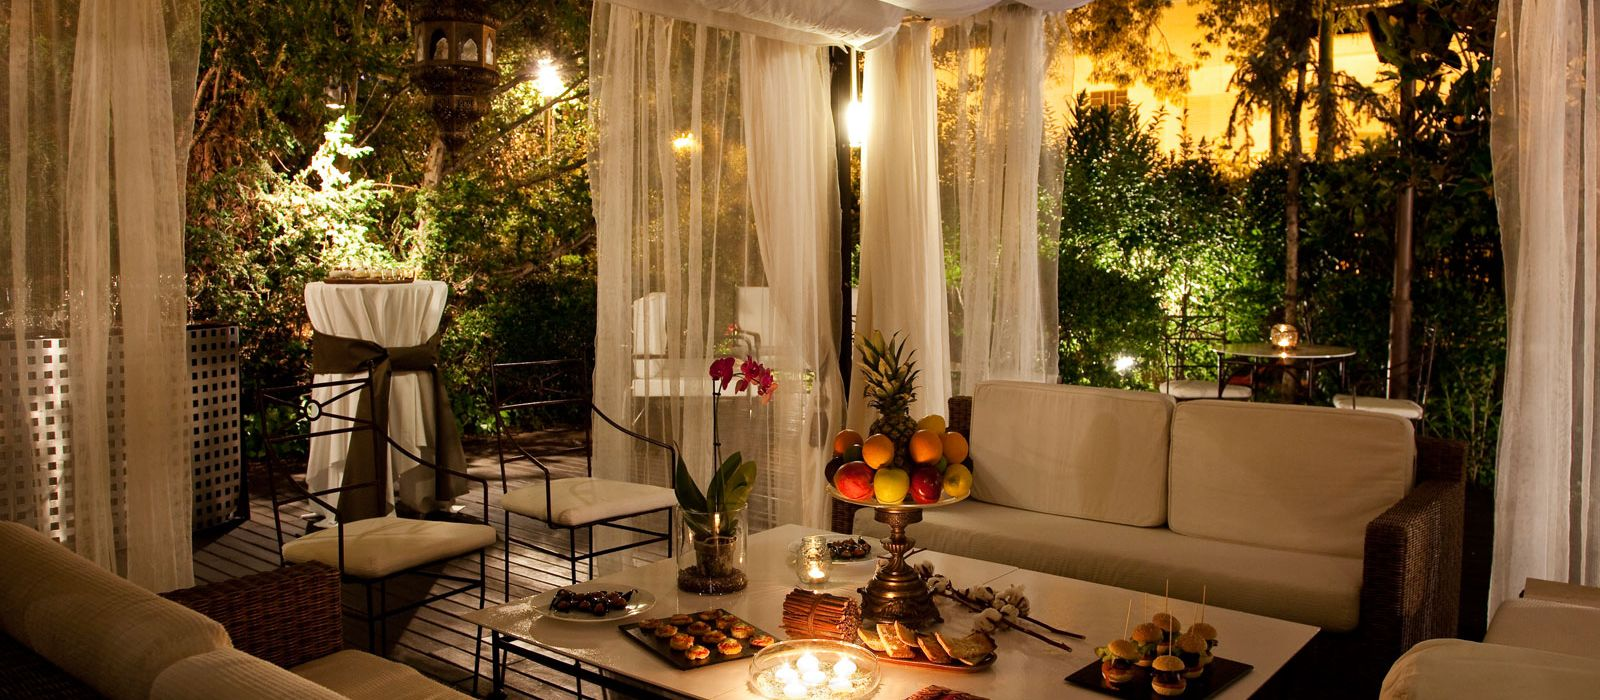 Pестораны La Garriga | Hotel Blancafort